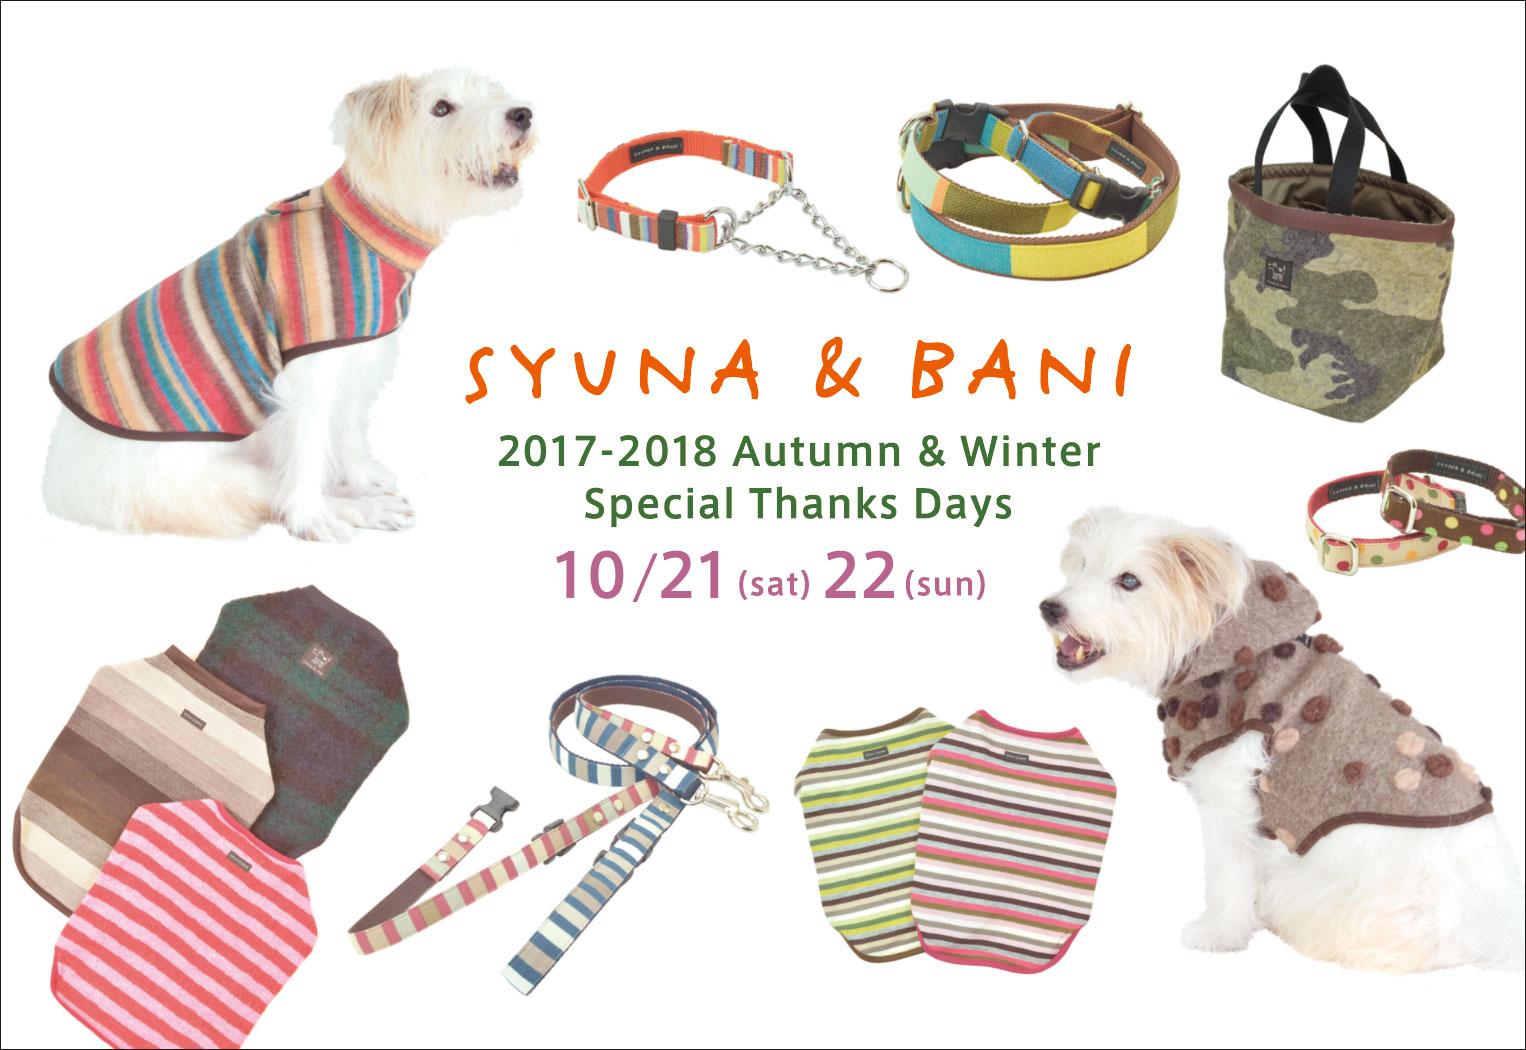 http://syuna-bani.net/blog/171011_aw.jpg